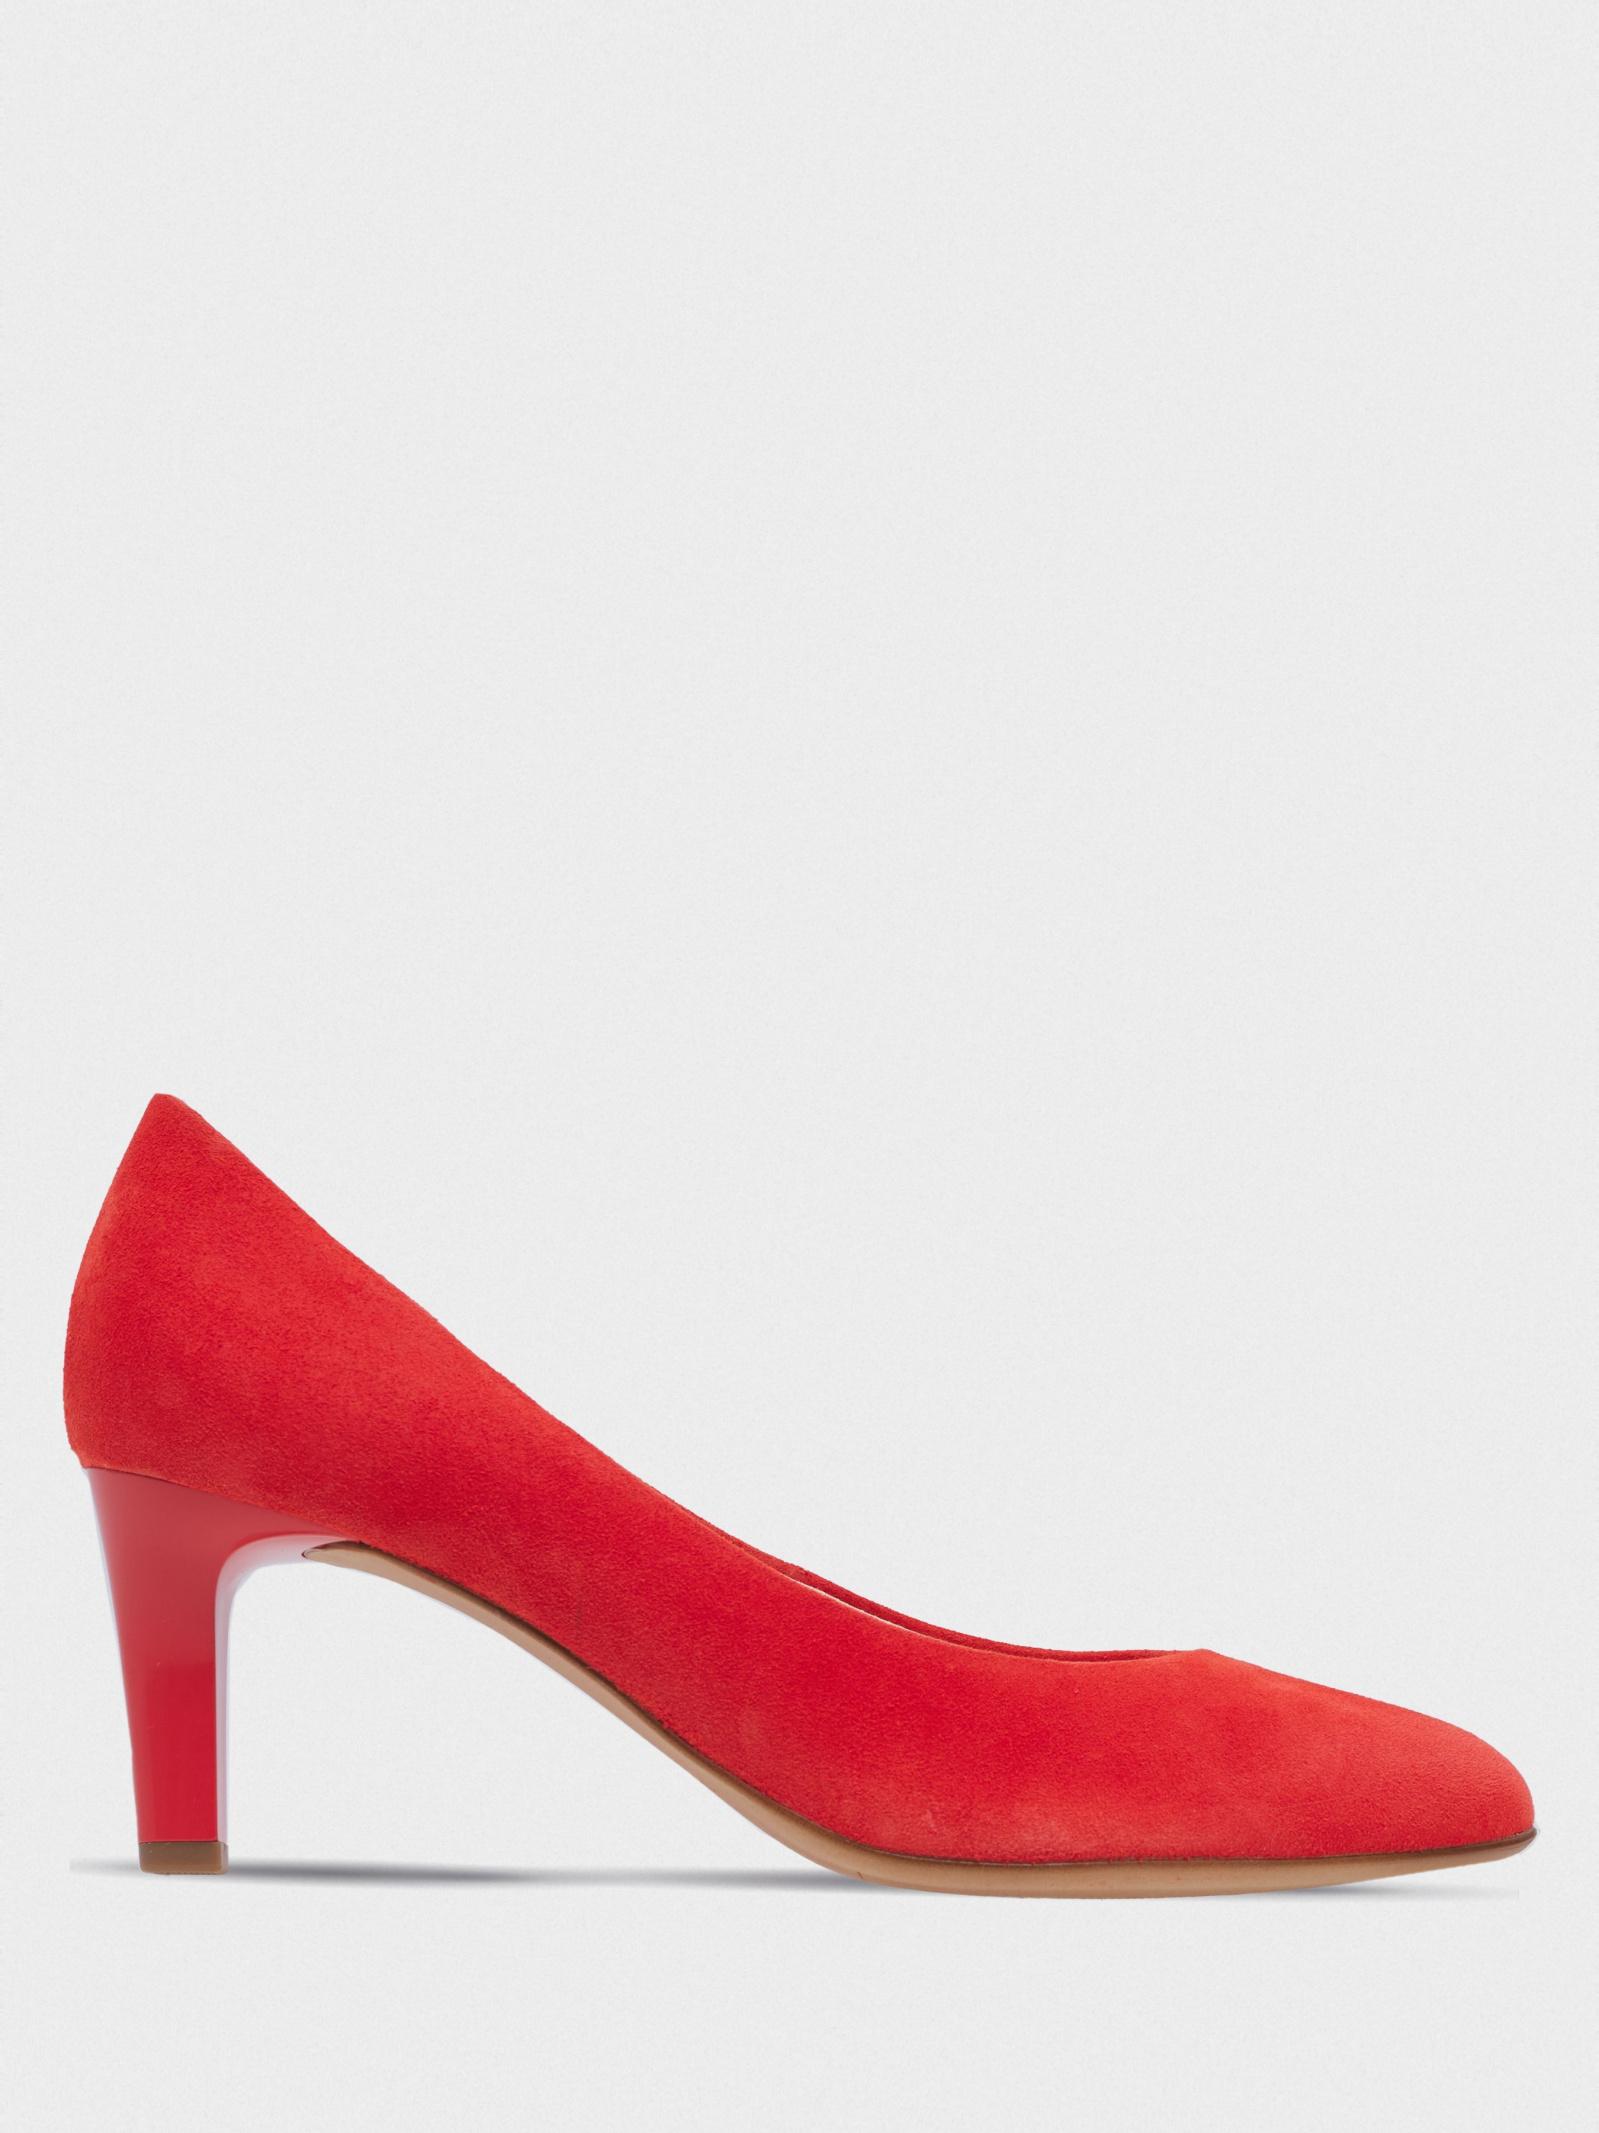 Туфли для женщин Hogl STARLIGHT YN4019 модная обувь, 2017